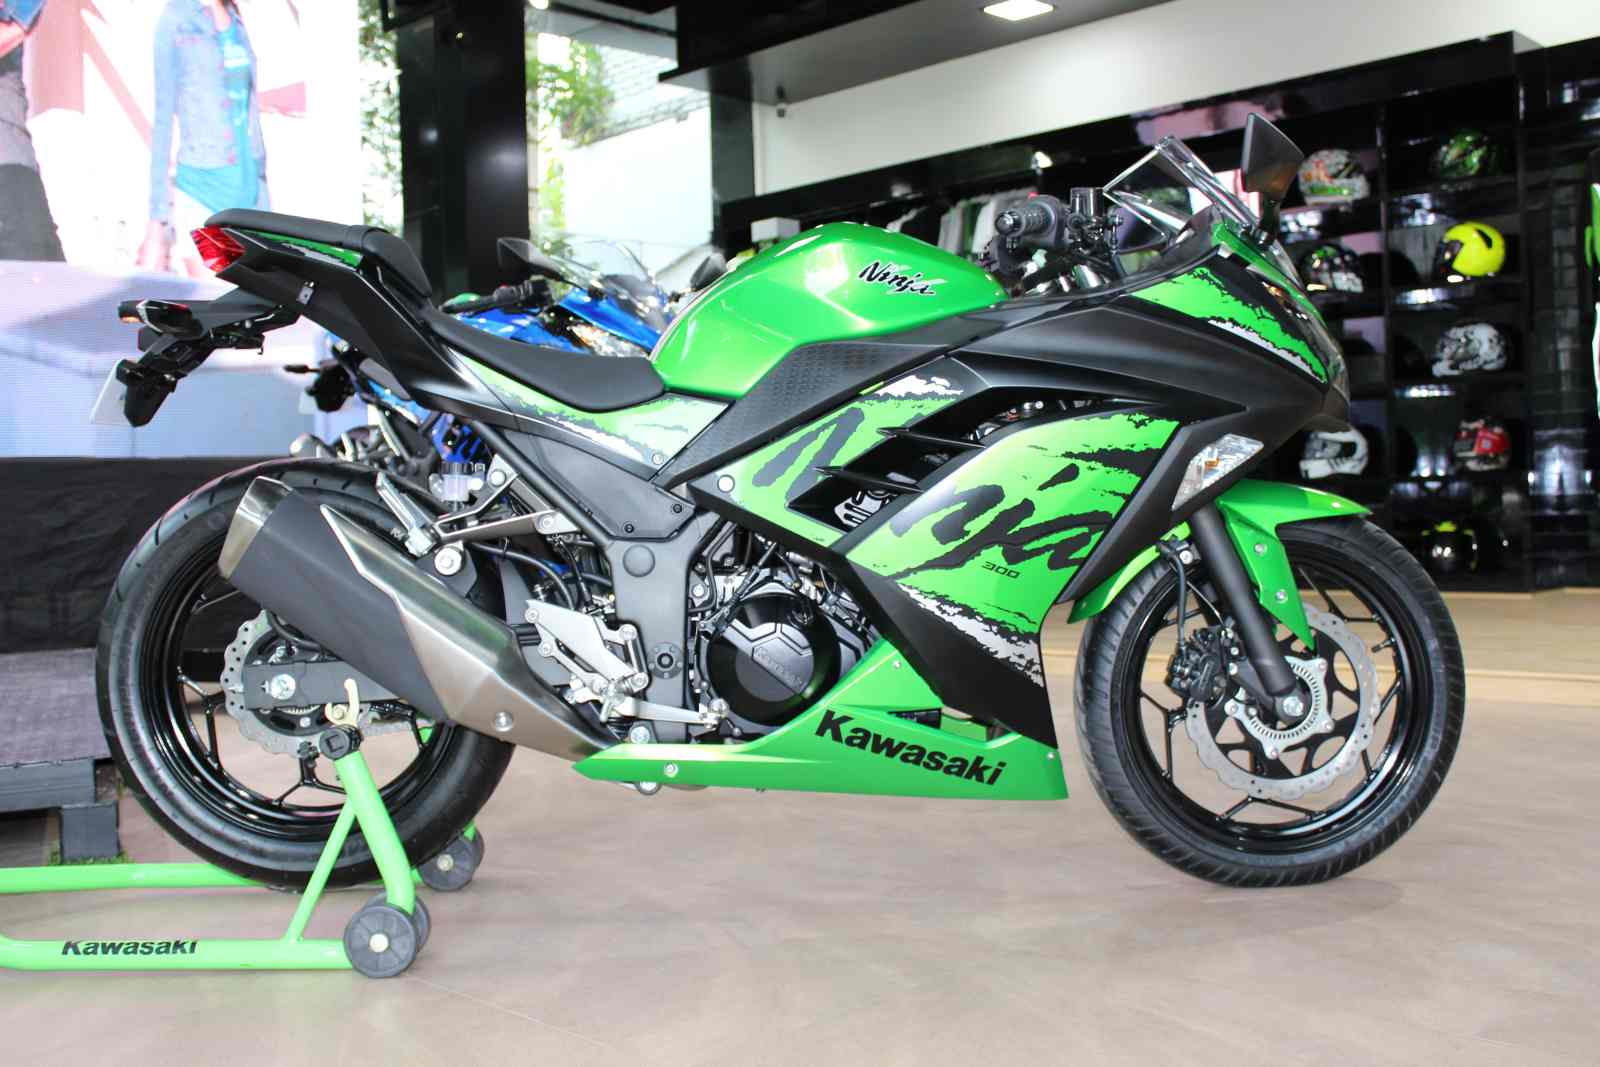 Kawasaki Ninja 300 Price In India Specifications Images Motoroids